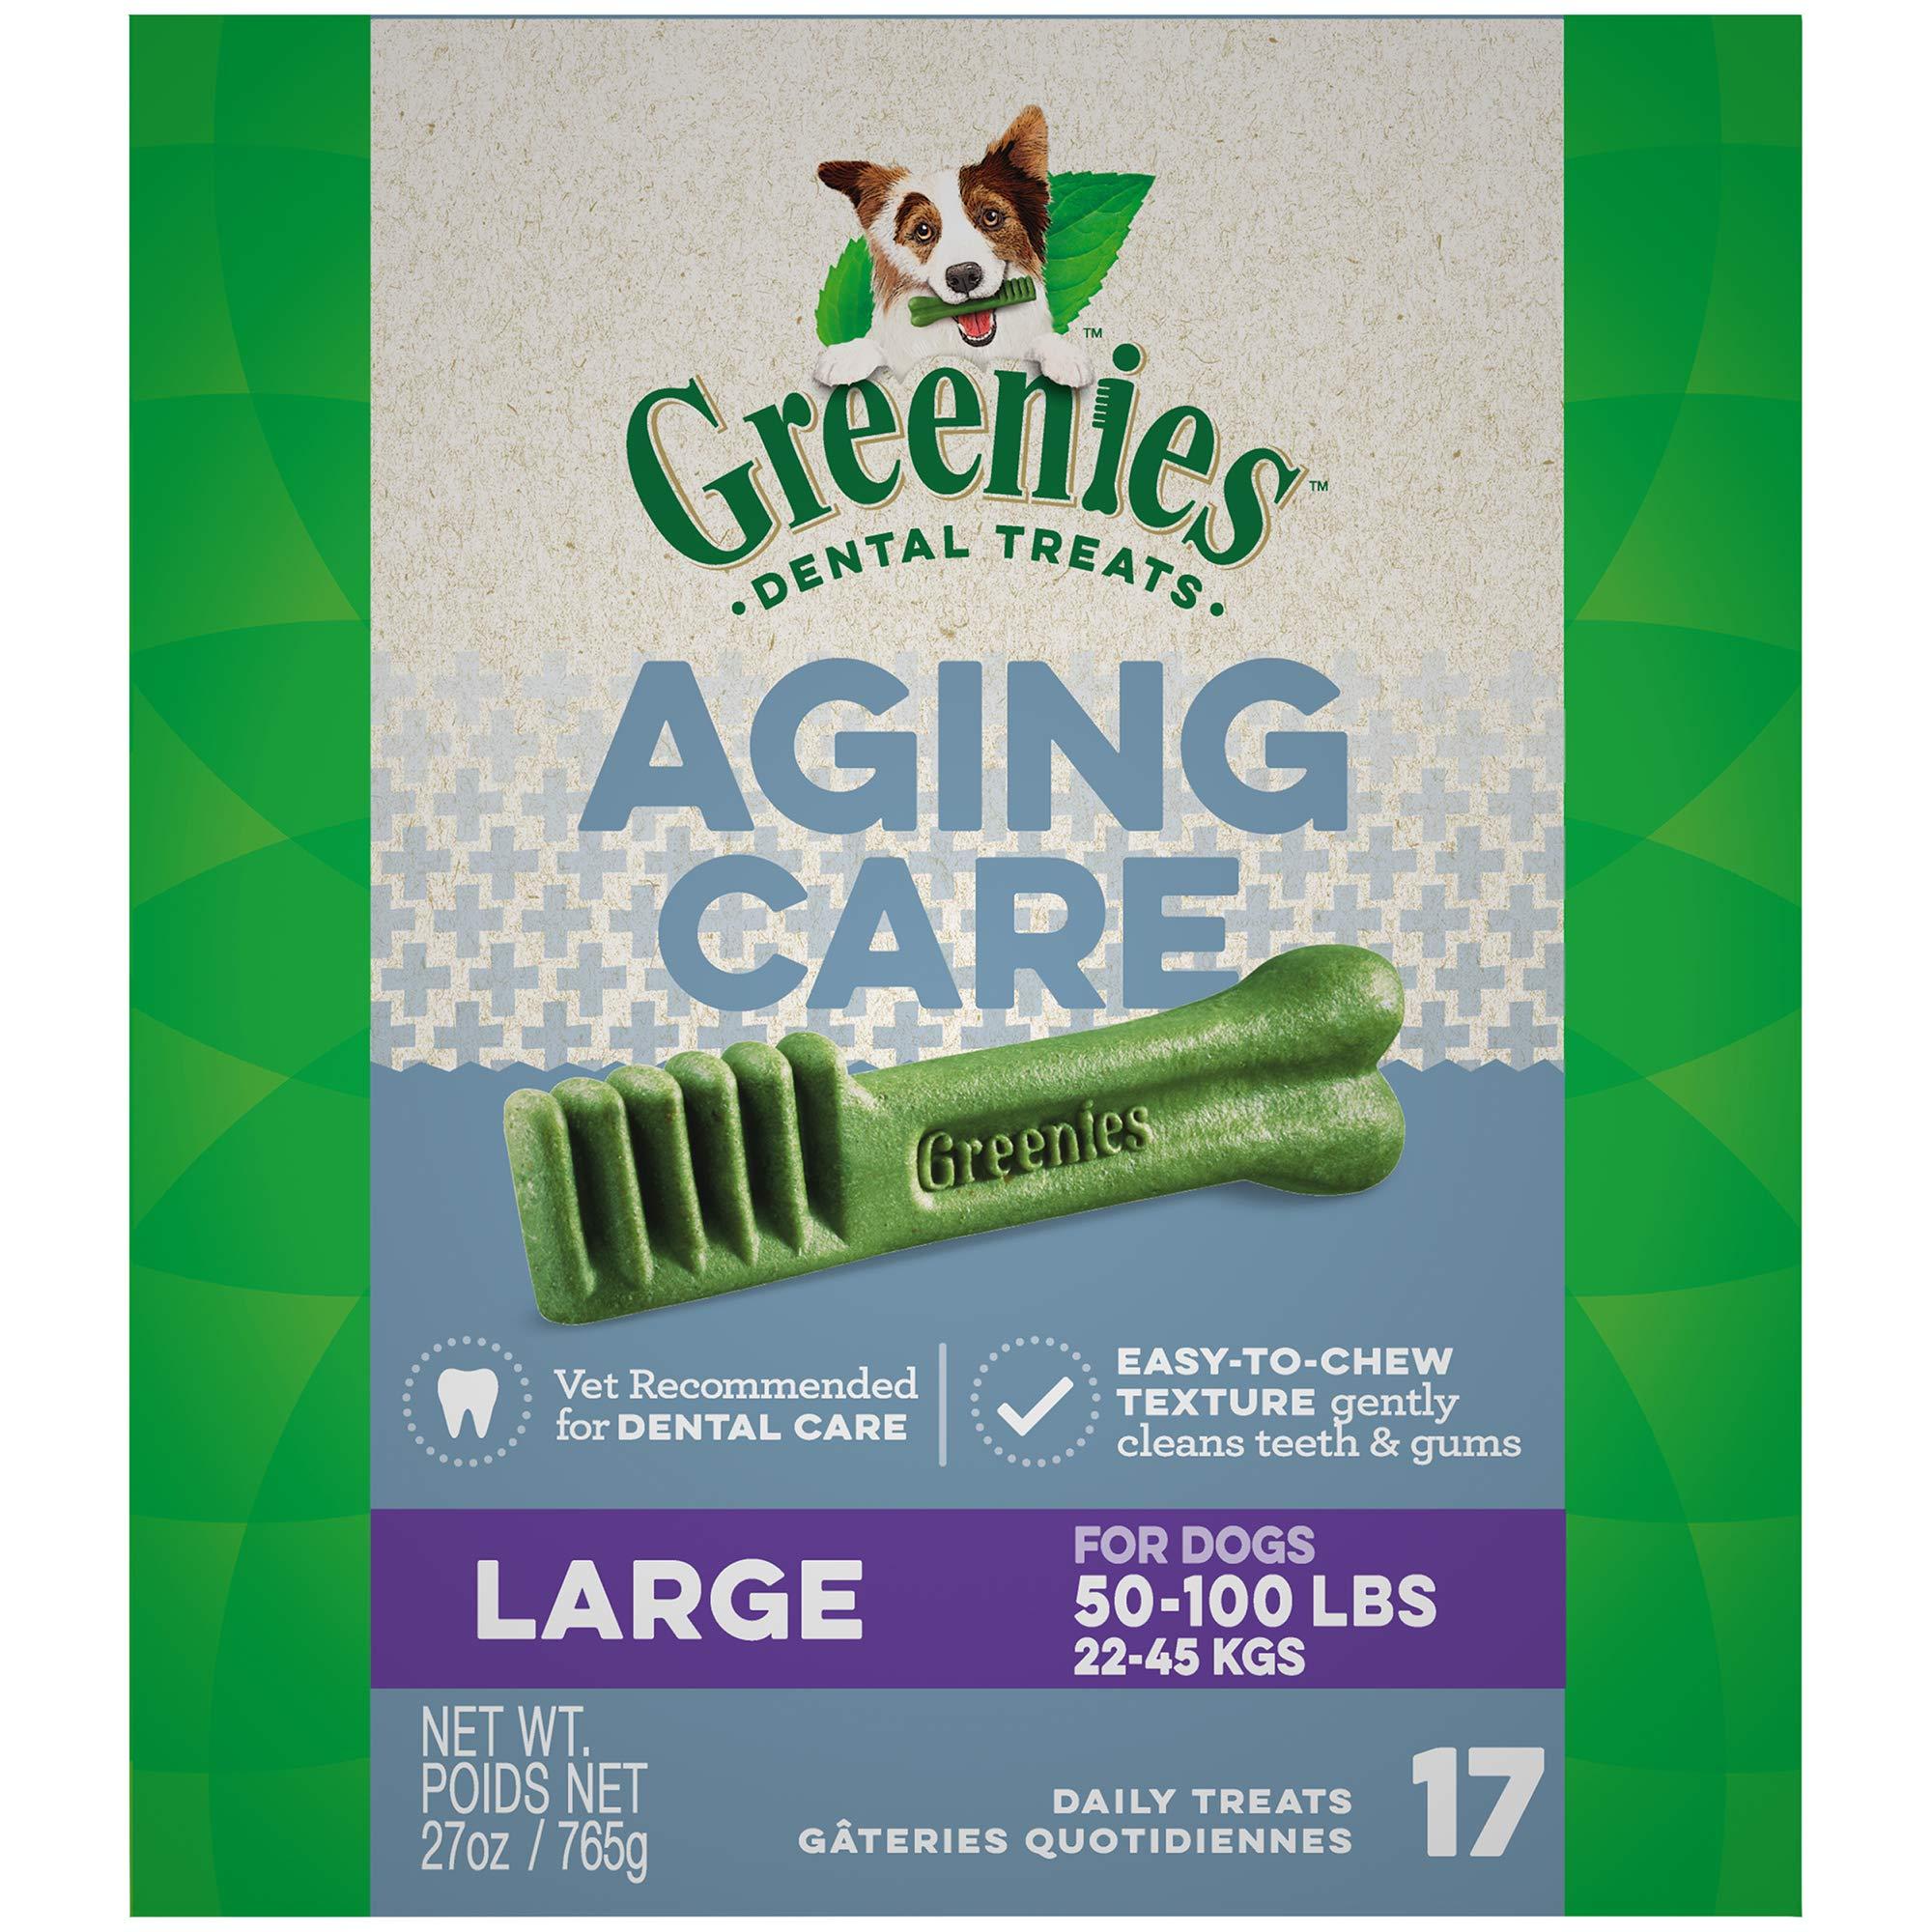 GREENIES Aging Care Large Size Dental Dog Treats, 27 oz. Pack